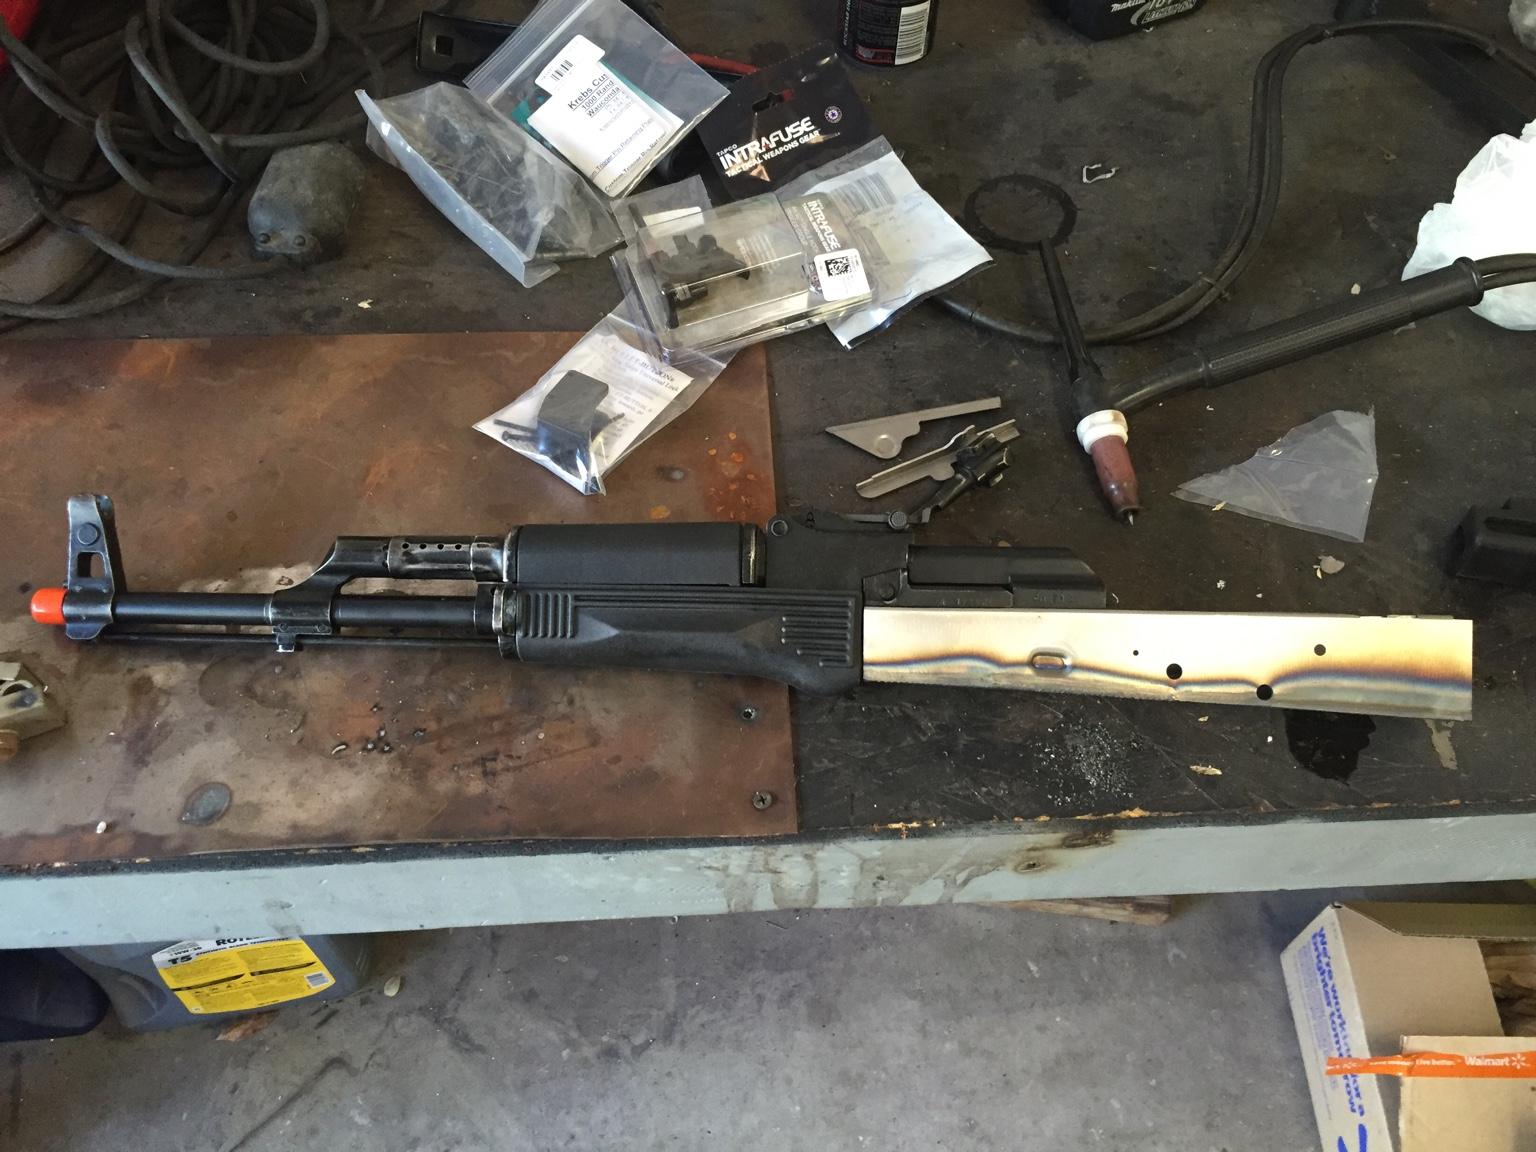 Hungarian AK-47 - First Build